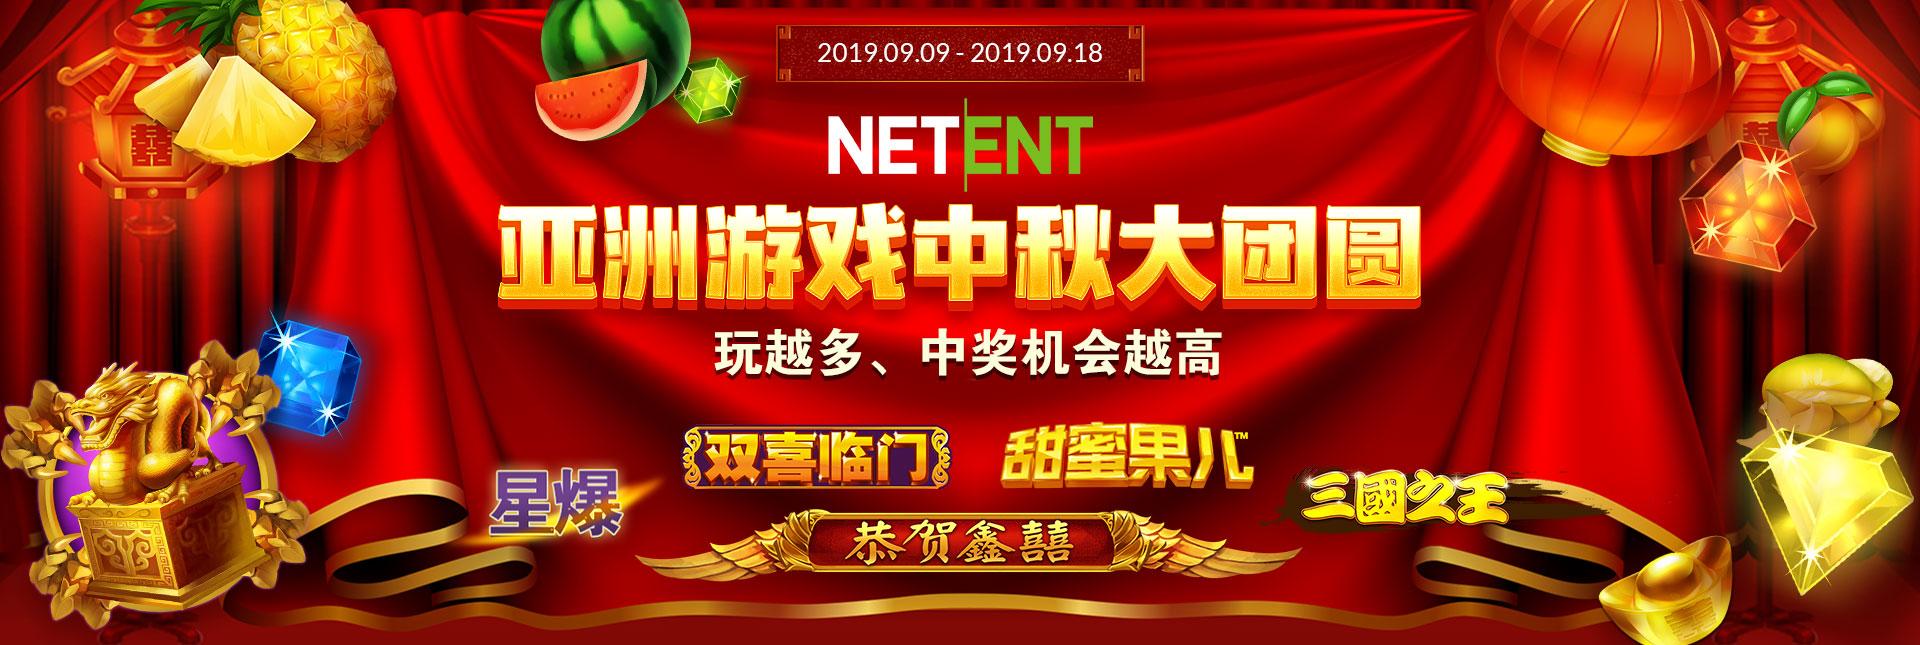 NETENTXFLOWGAMING 獨家推广活动: NetEnt 亚洲游戏中秋大團圓!